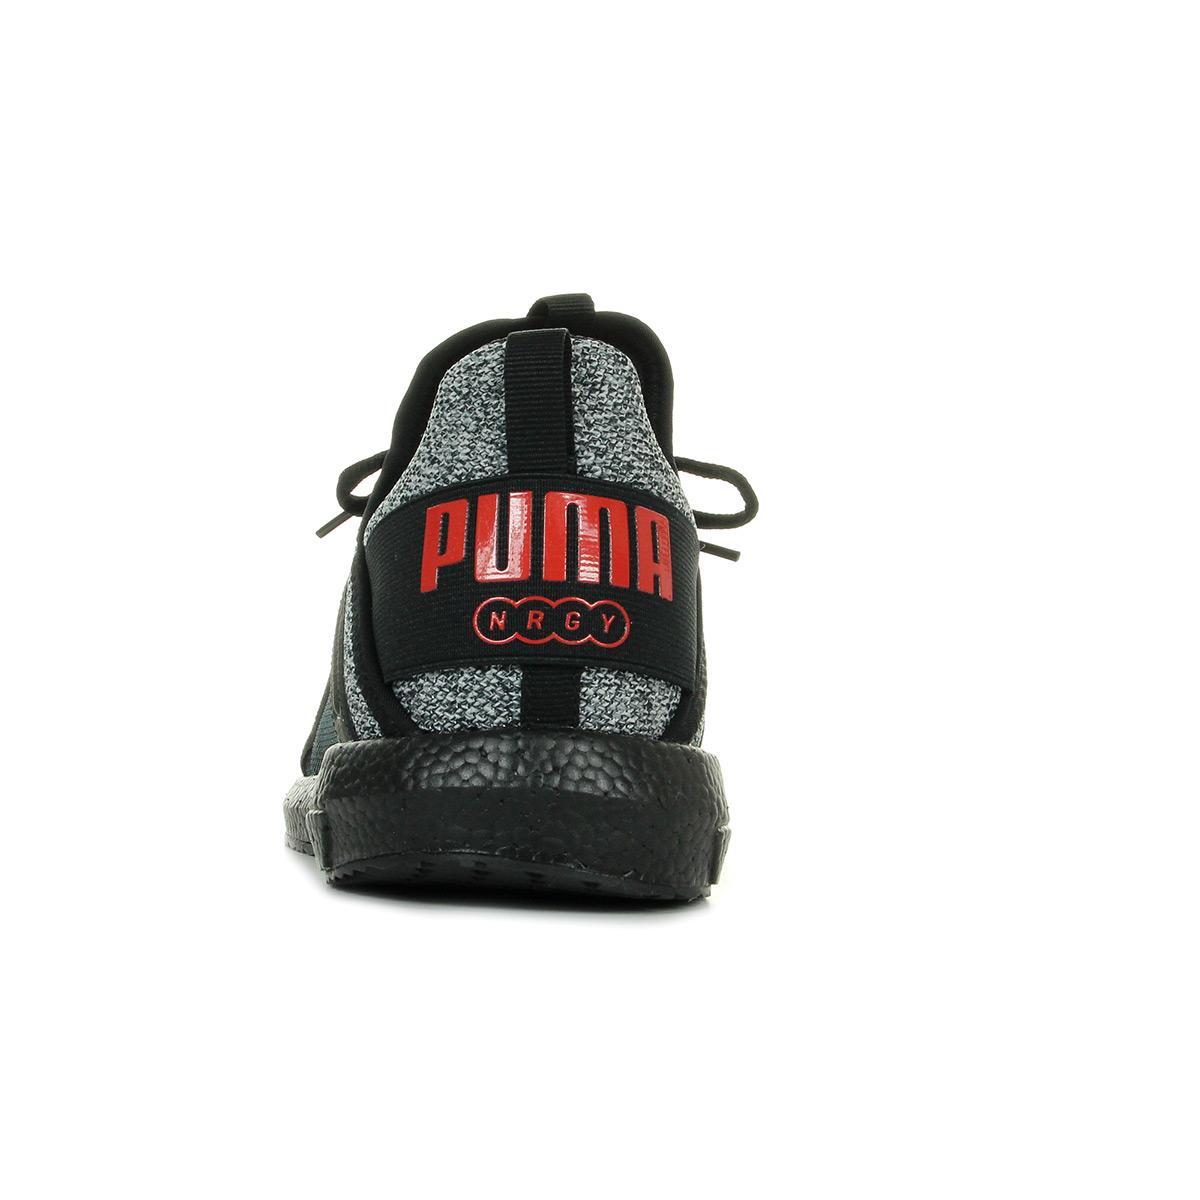 Puma Mega NRGY Knit 19037105, Baskets mode homme